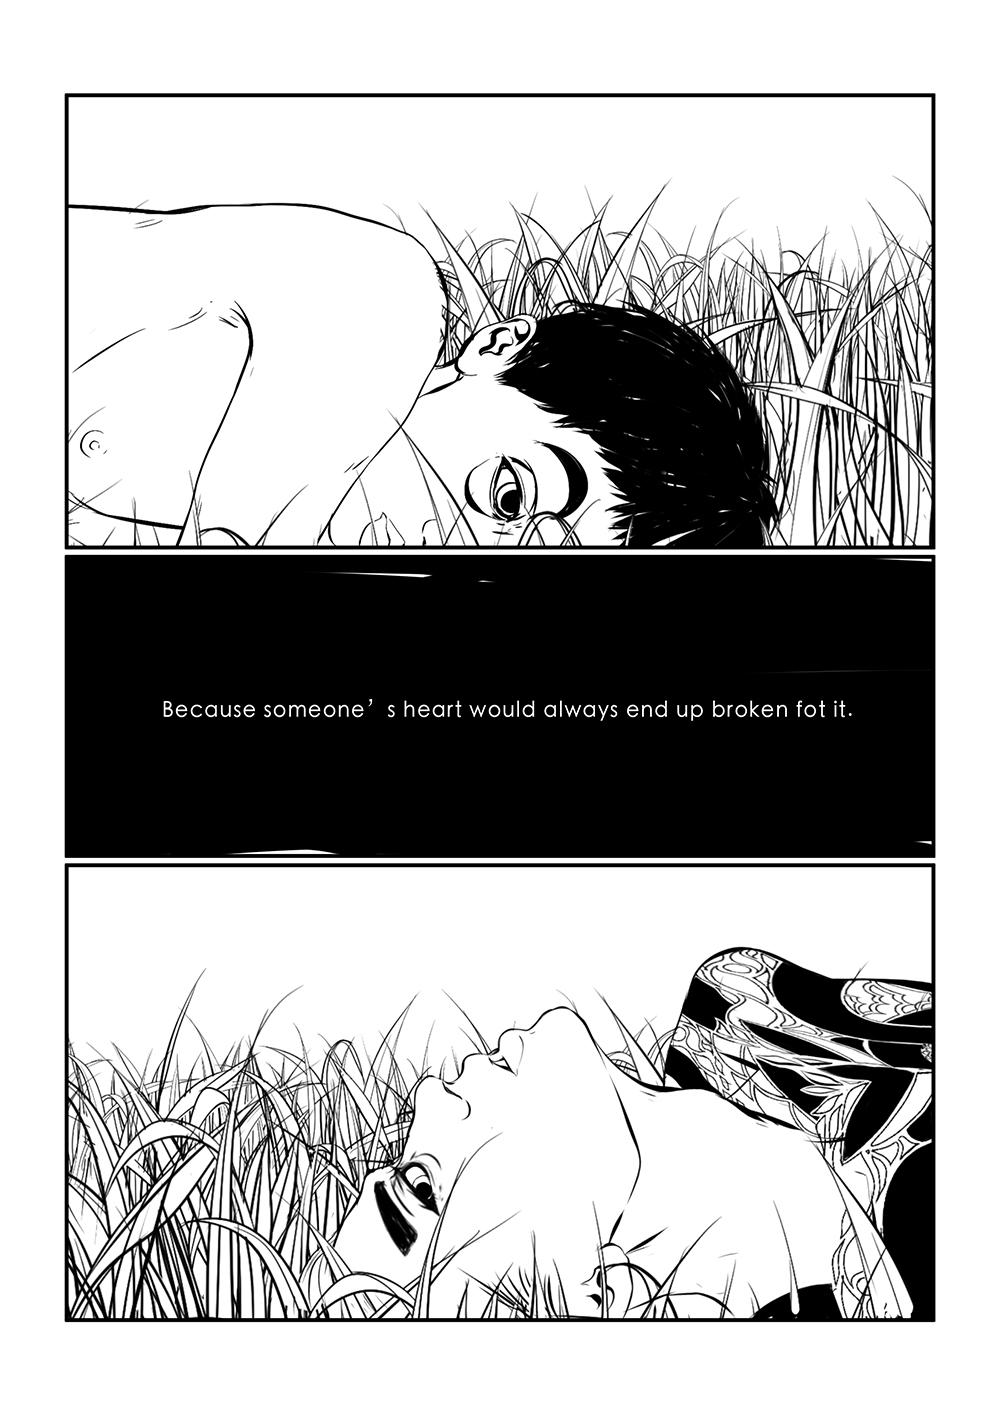 mojowang_illustration_betweenrivers_24_13.jpg